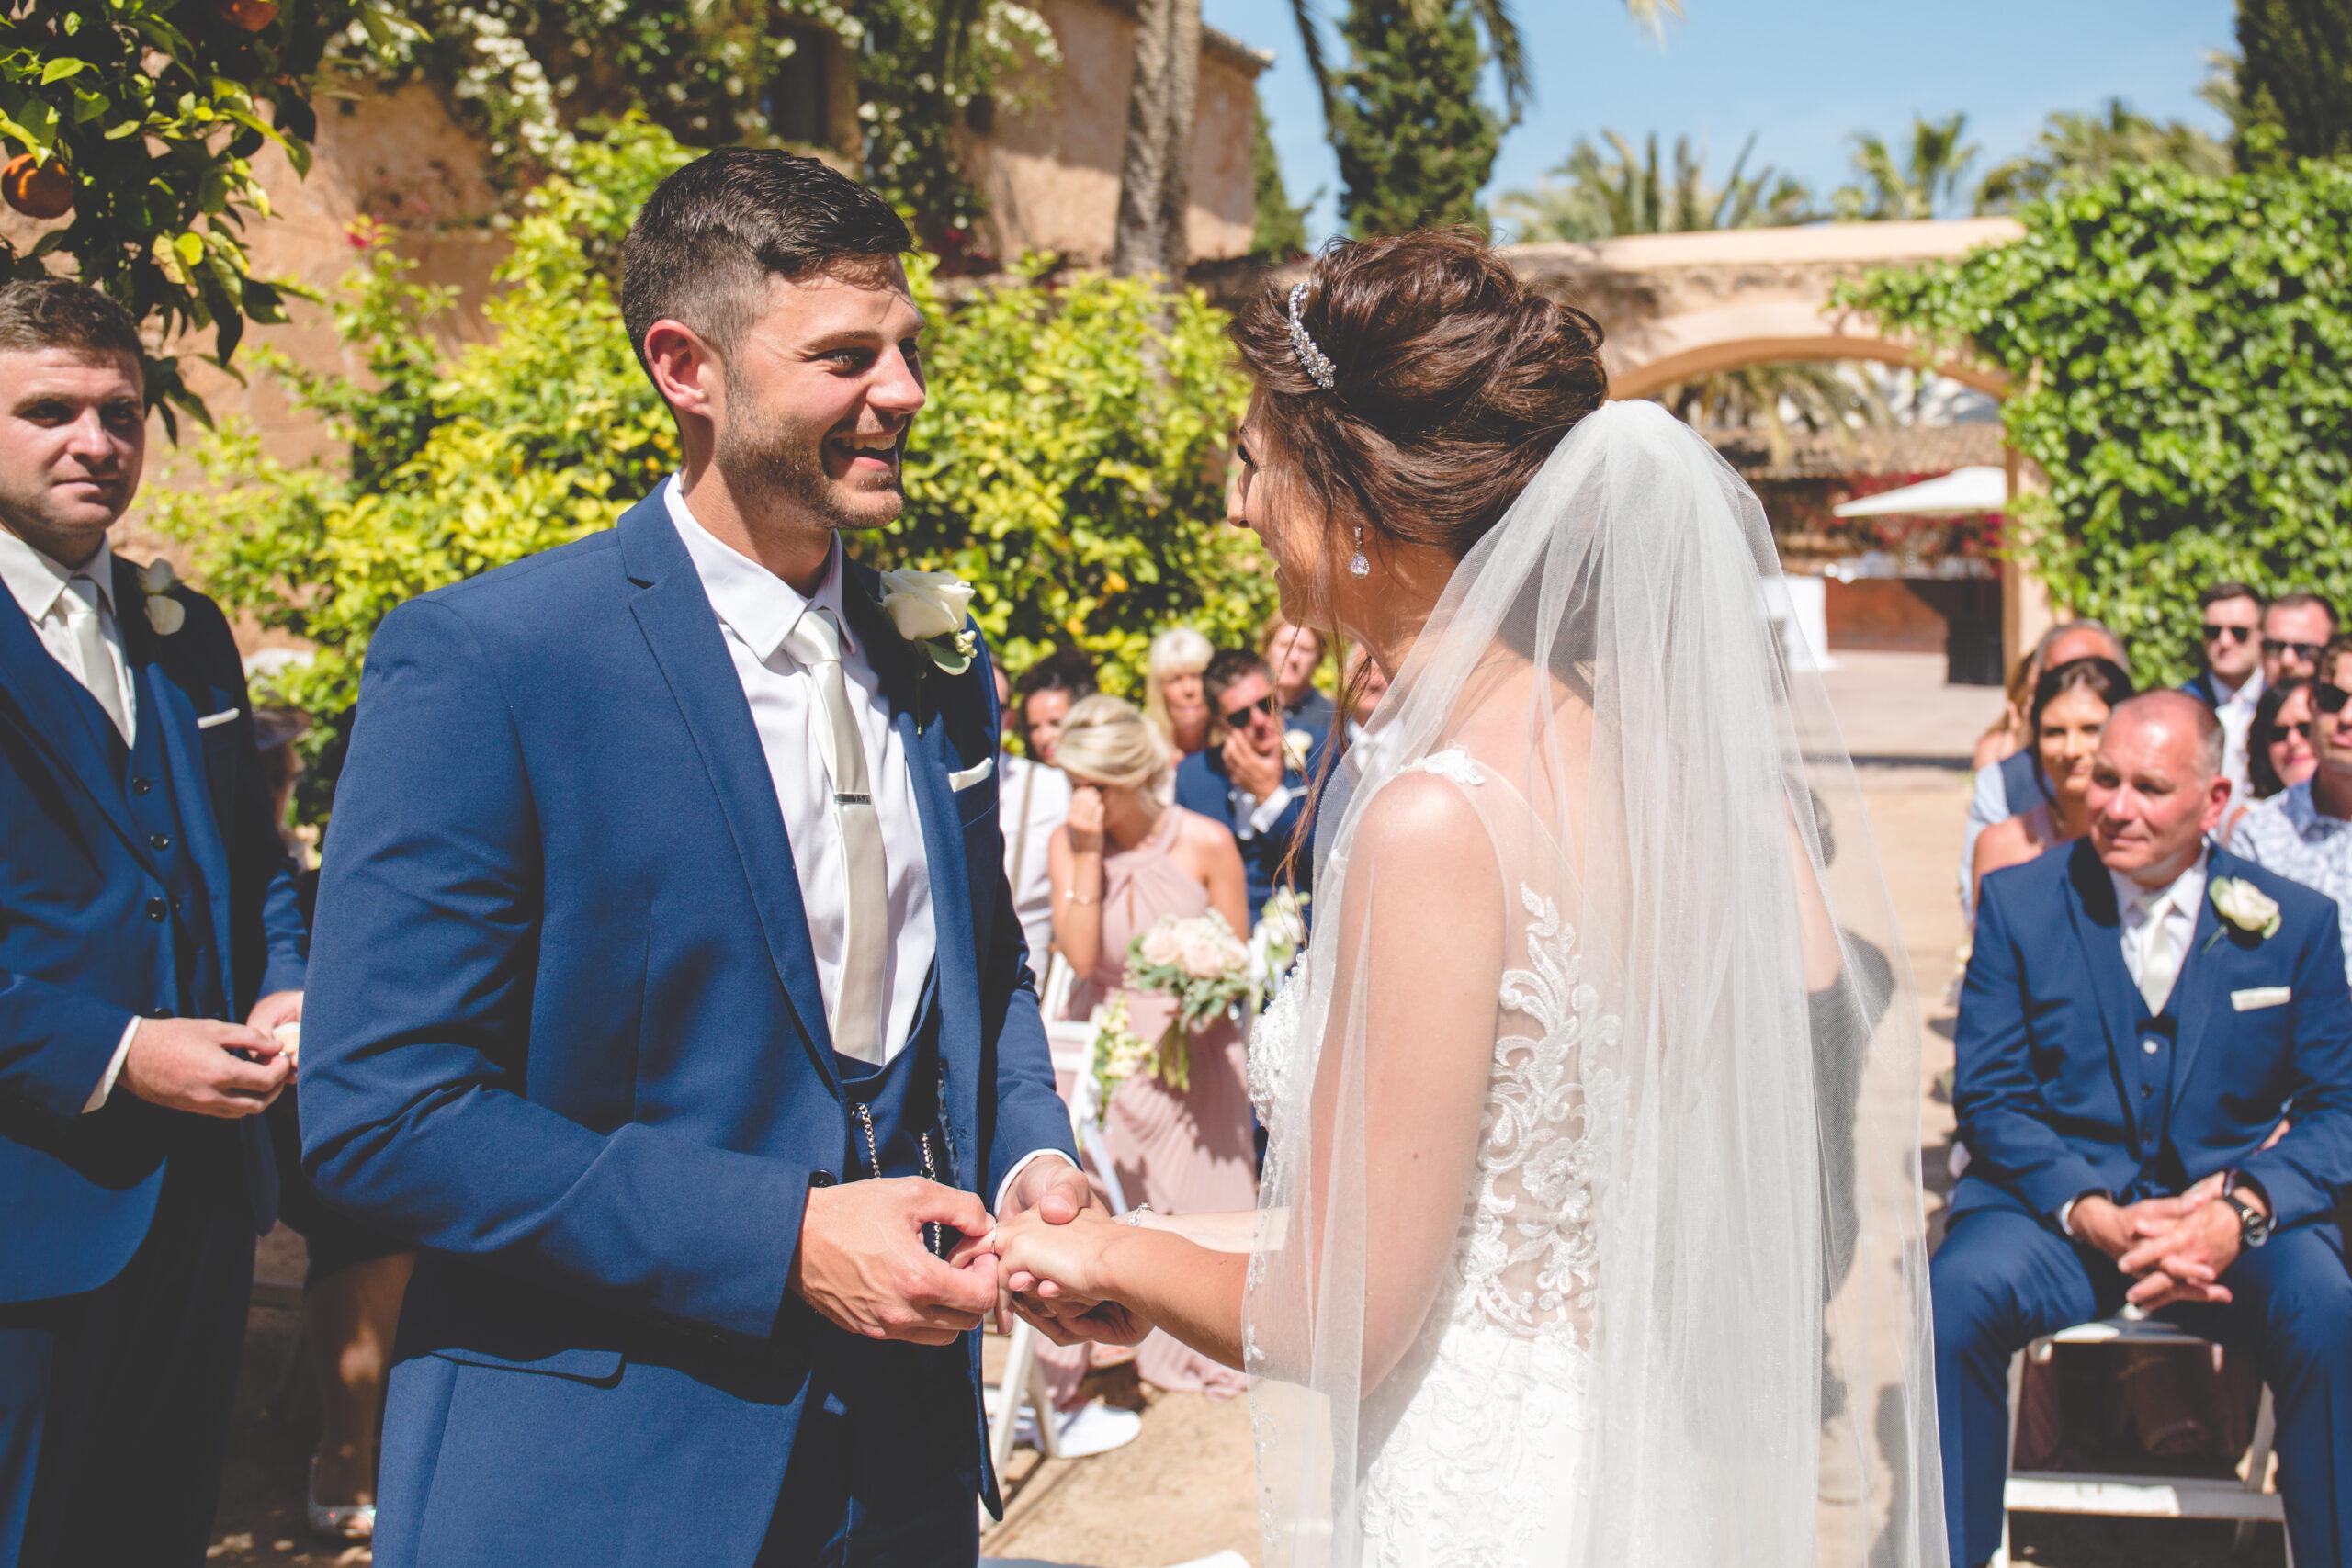 Wedding ceremony in the Finca's courtyard